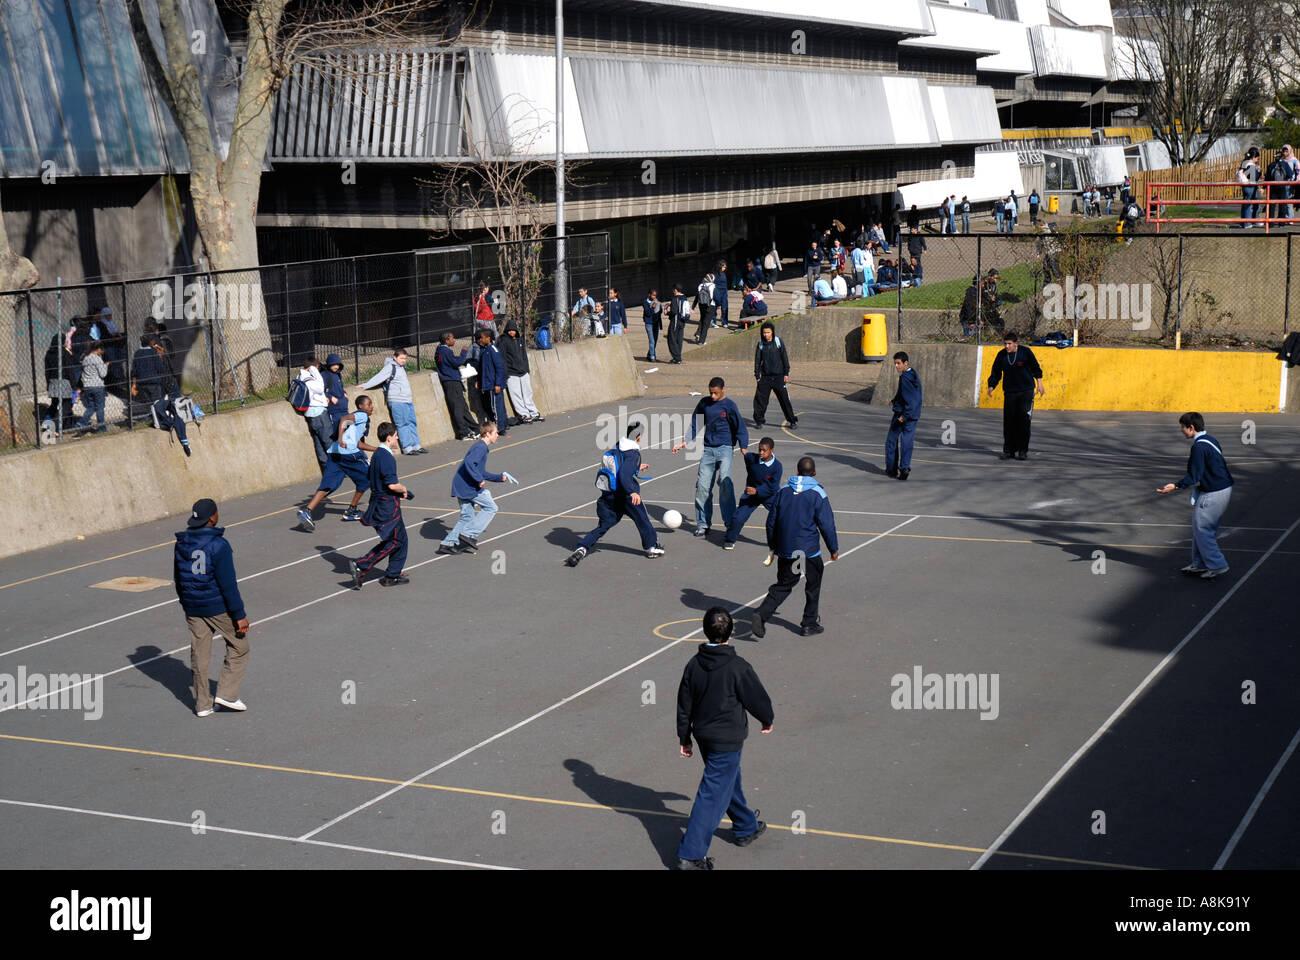 how to play concrete school yard ianpo